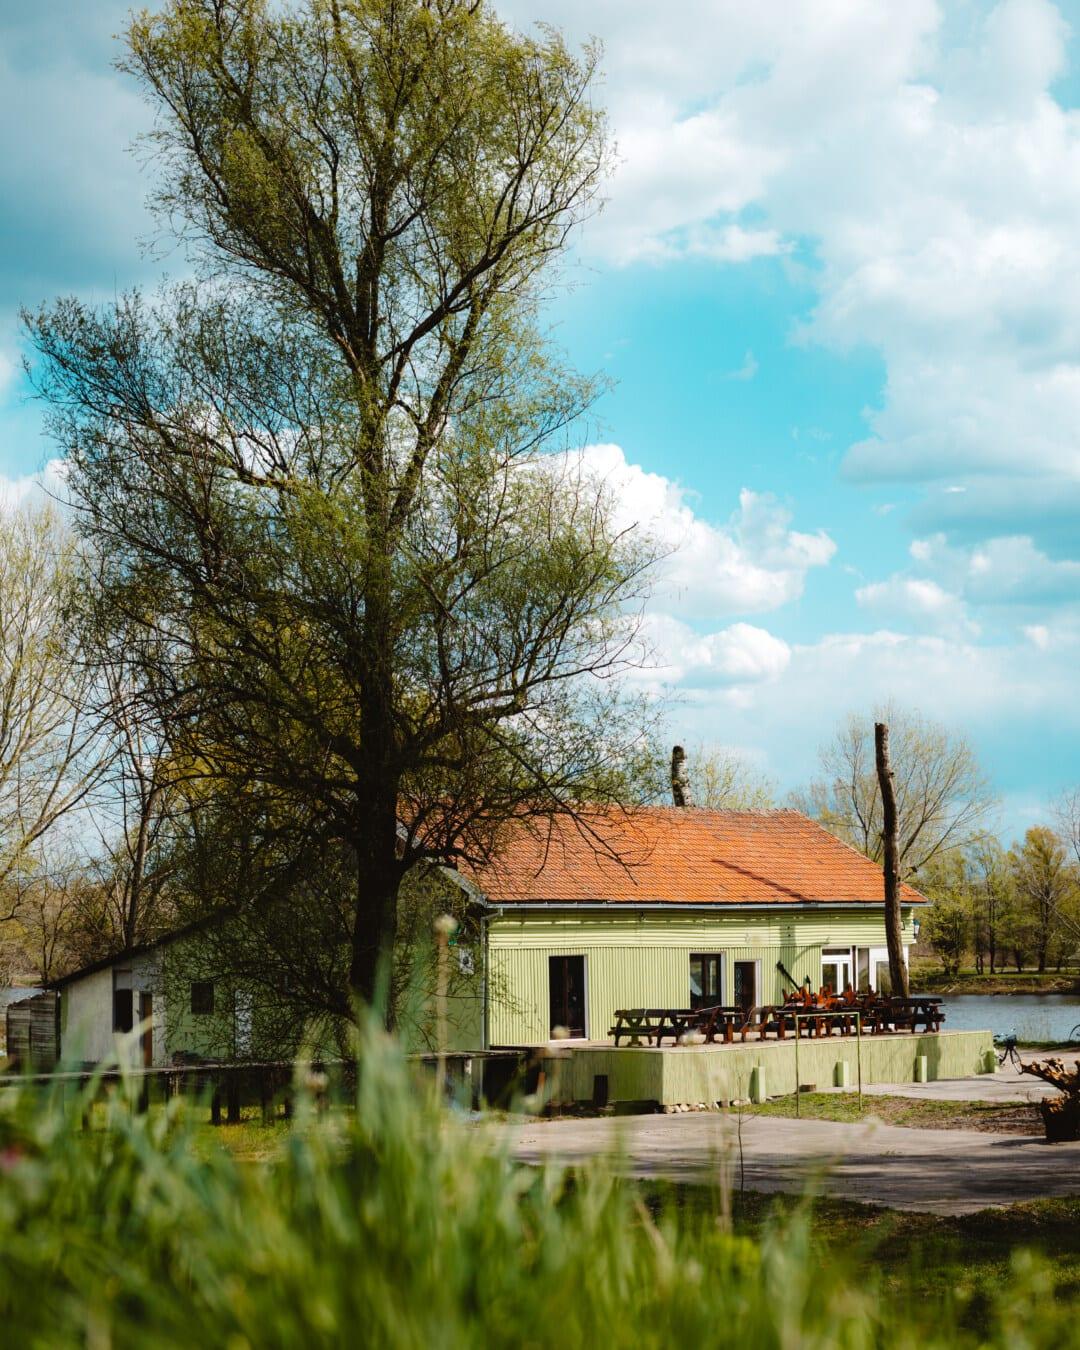 Natur, Hinterhof, am See, Haushalt, Haus, Restaurant, Garten, Frühling, Struktur, Gebäude